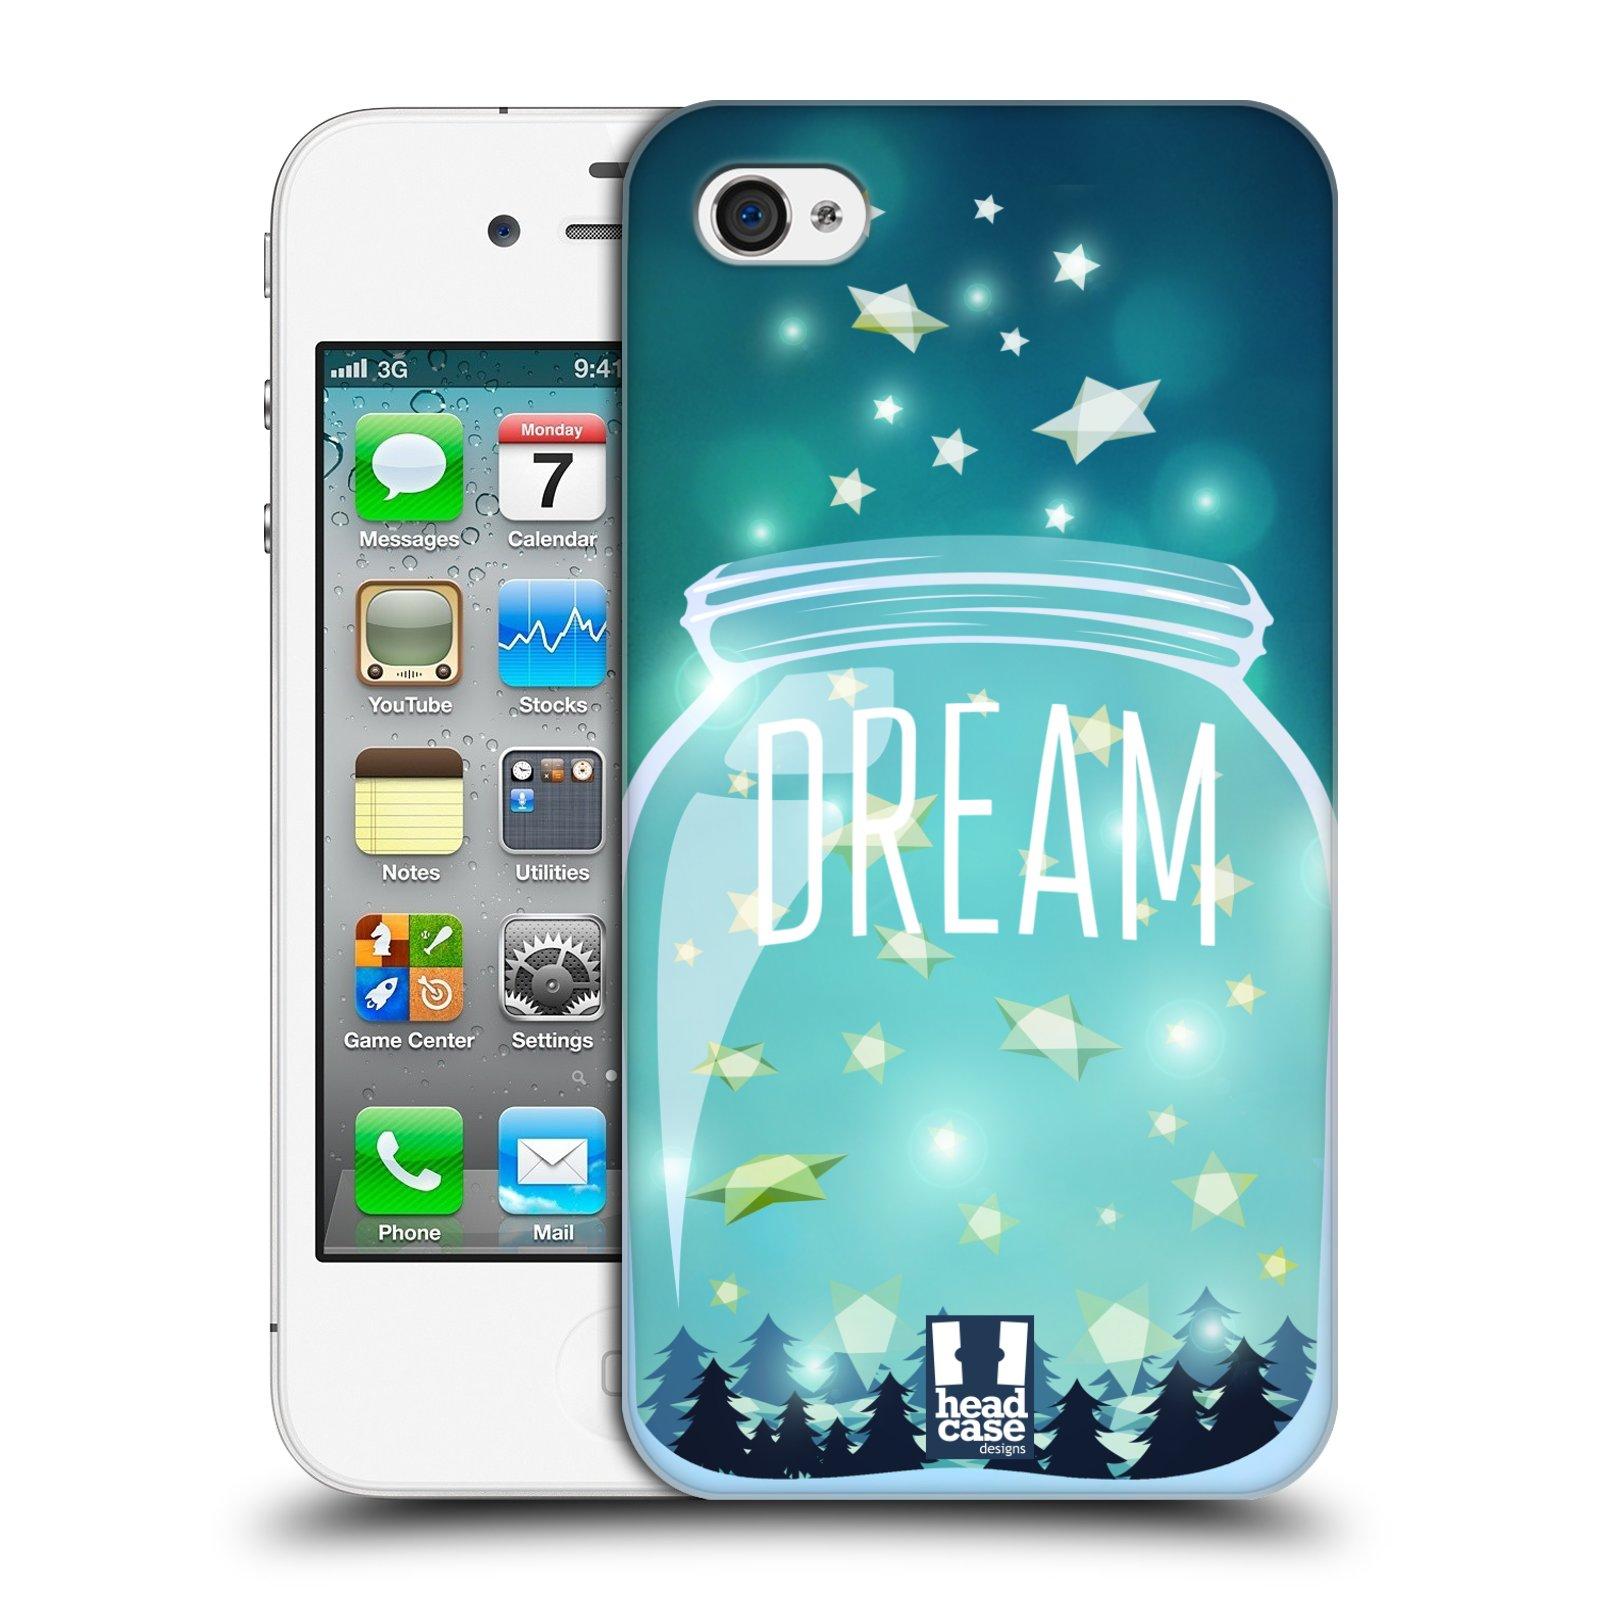 Plastové pouzdro na mobil Apple iPhone 4 a 4S HEAD CASE SKLENICE DREAM